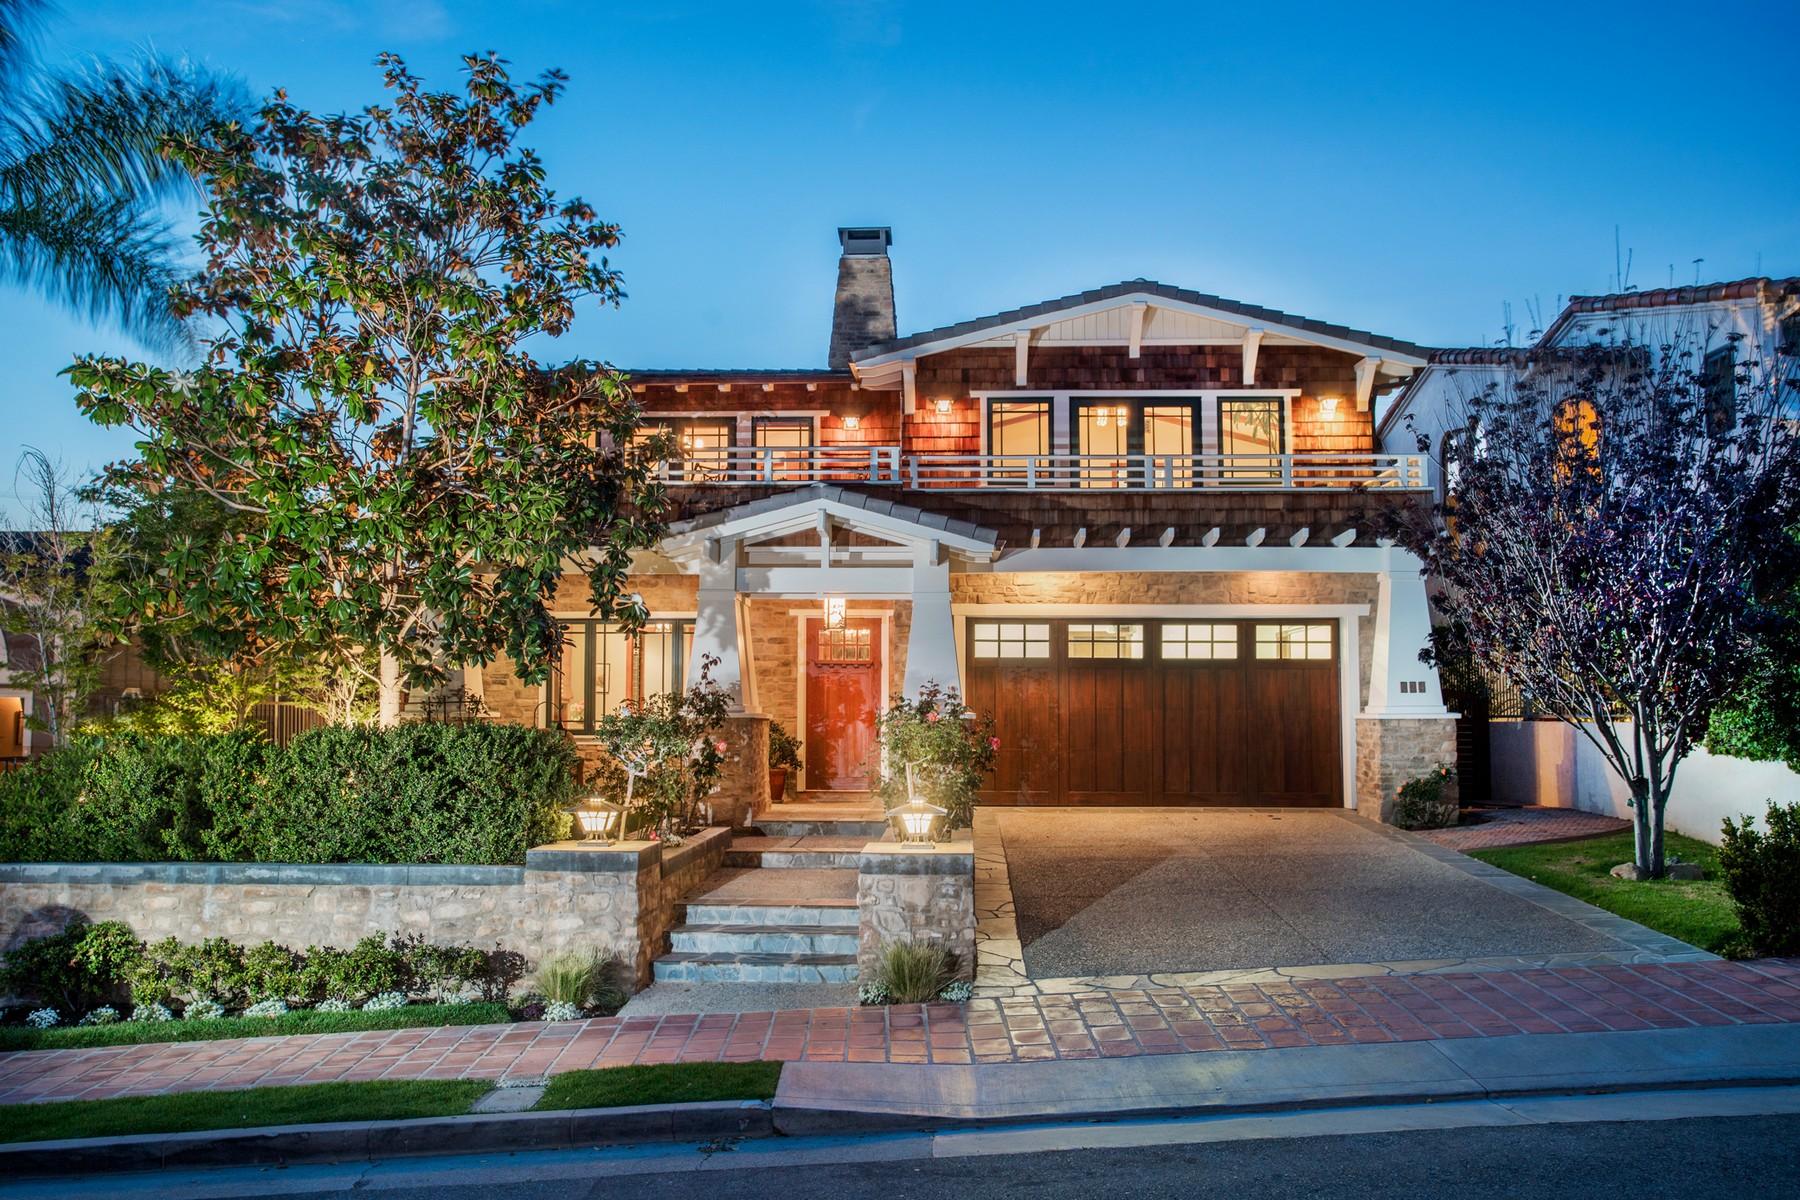 Casa Unifamiliar por un Venta en 224 W. Avenida Valencia San Clemente, California, 92672 Estados Unidos